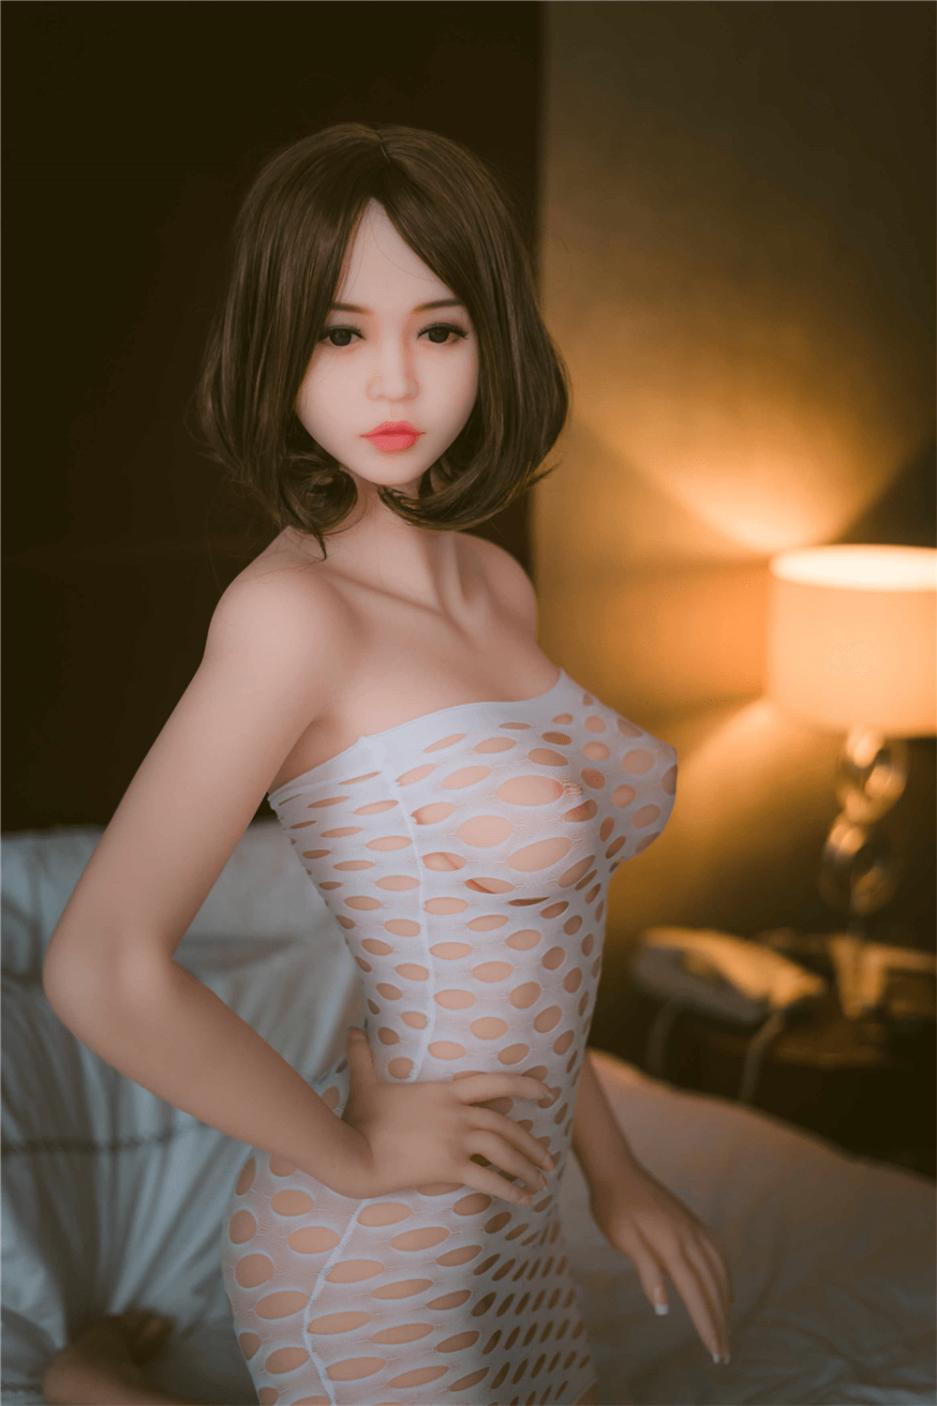 Cute Sex Doll With A Fork On The Waist